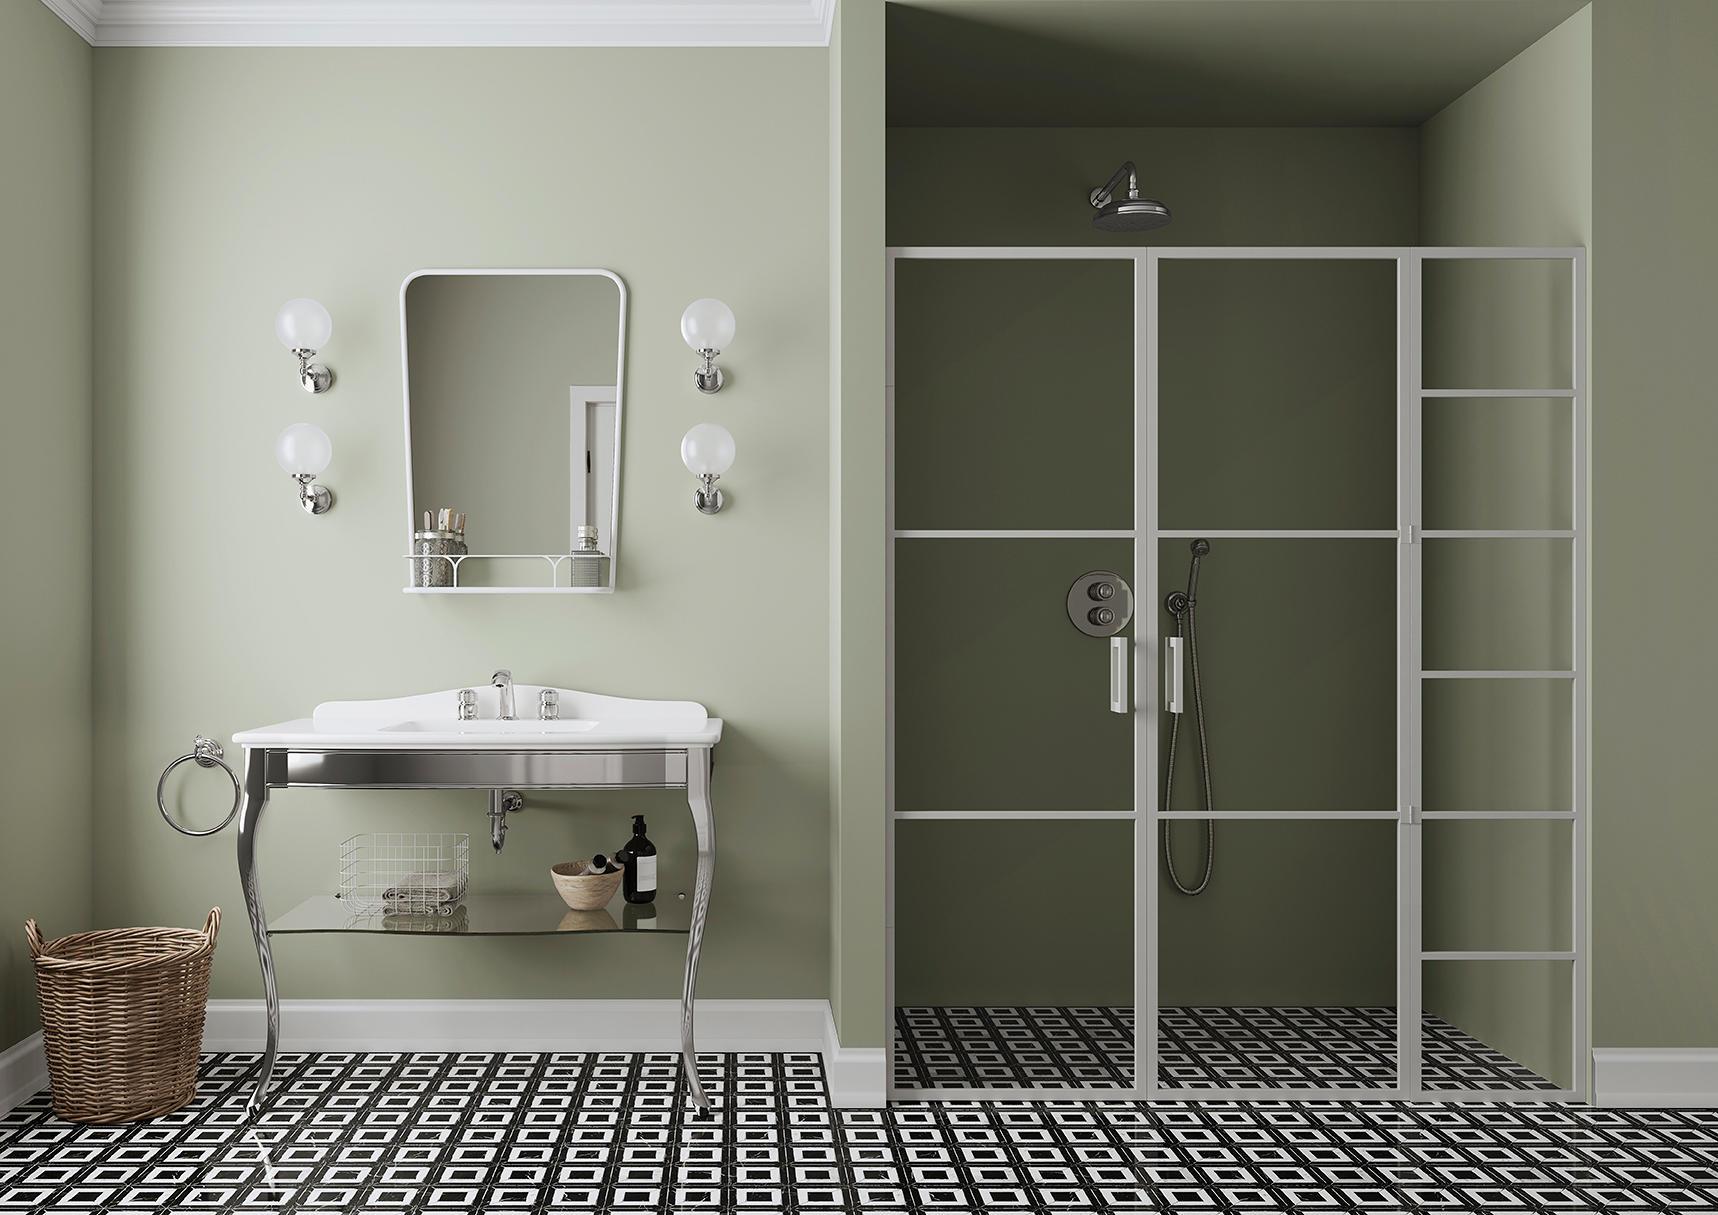 Outlet Arredamento Toscana.Jacqueline Console Wash Basins From Devon Devon Architonic